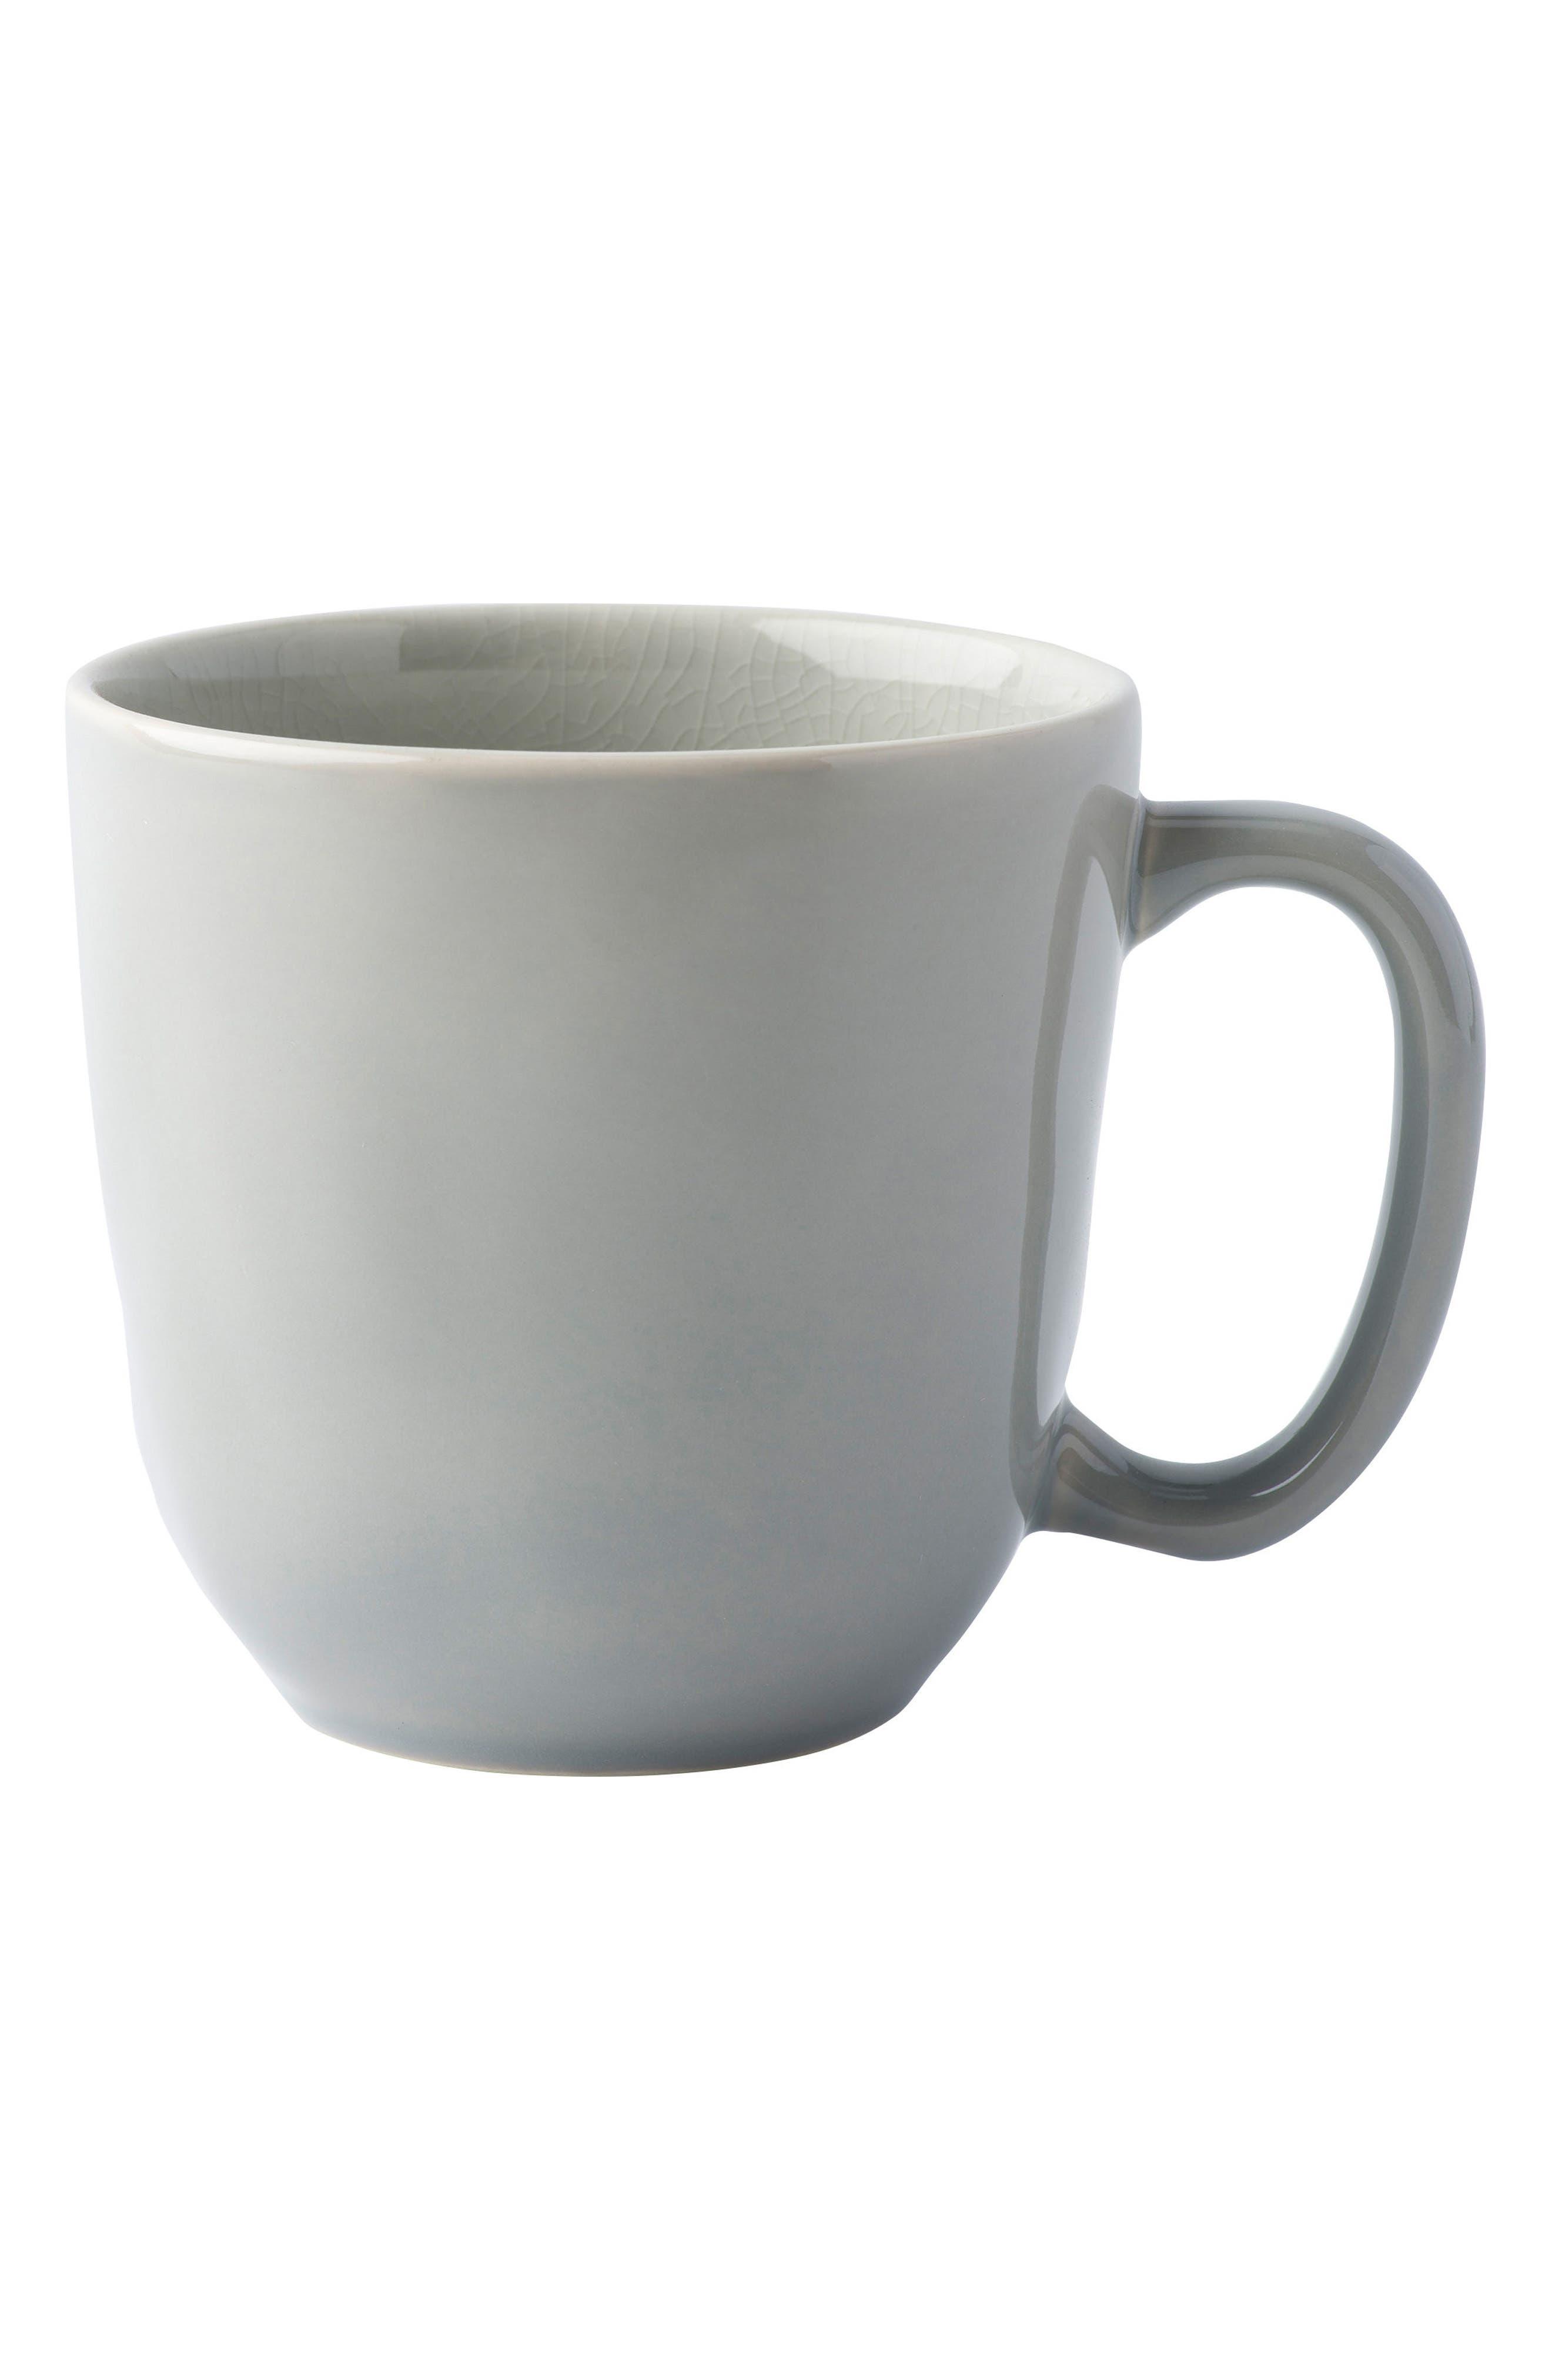 JULISKA,                             Puro Coffee Cup,                             Main thumbnail 1, color,                             MIST GREY CRACKLE